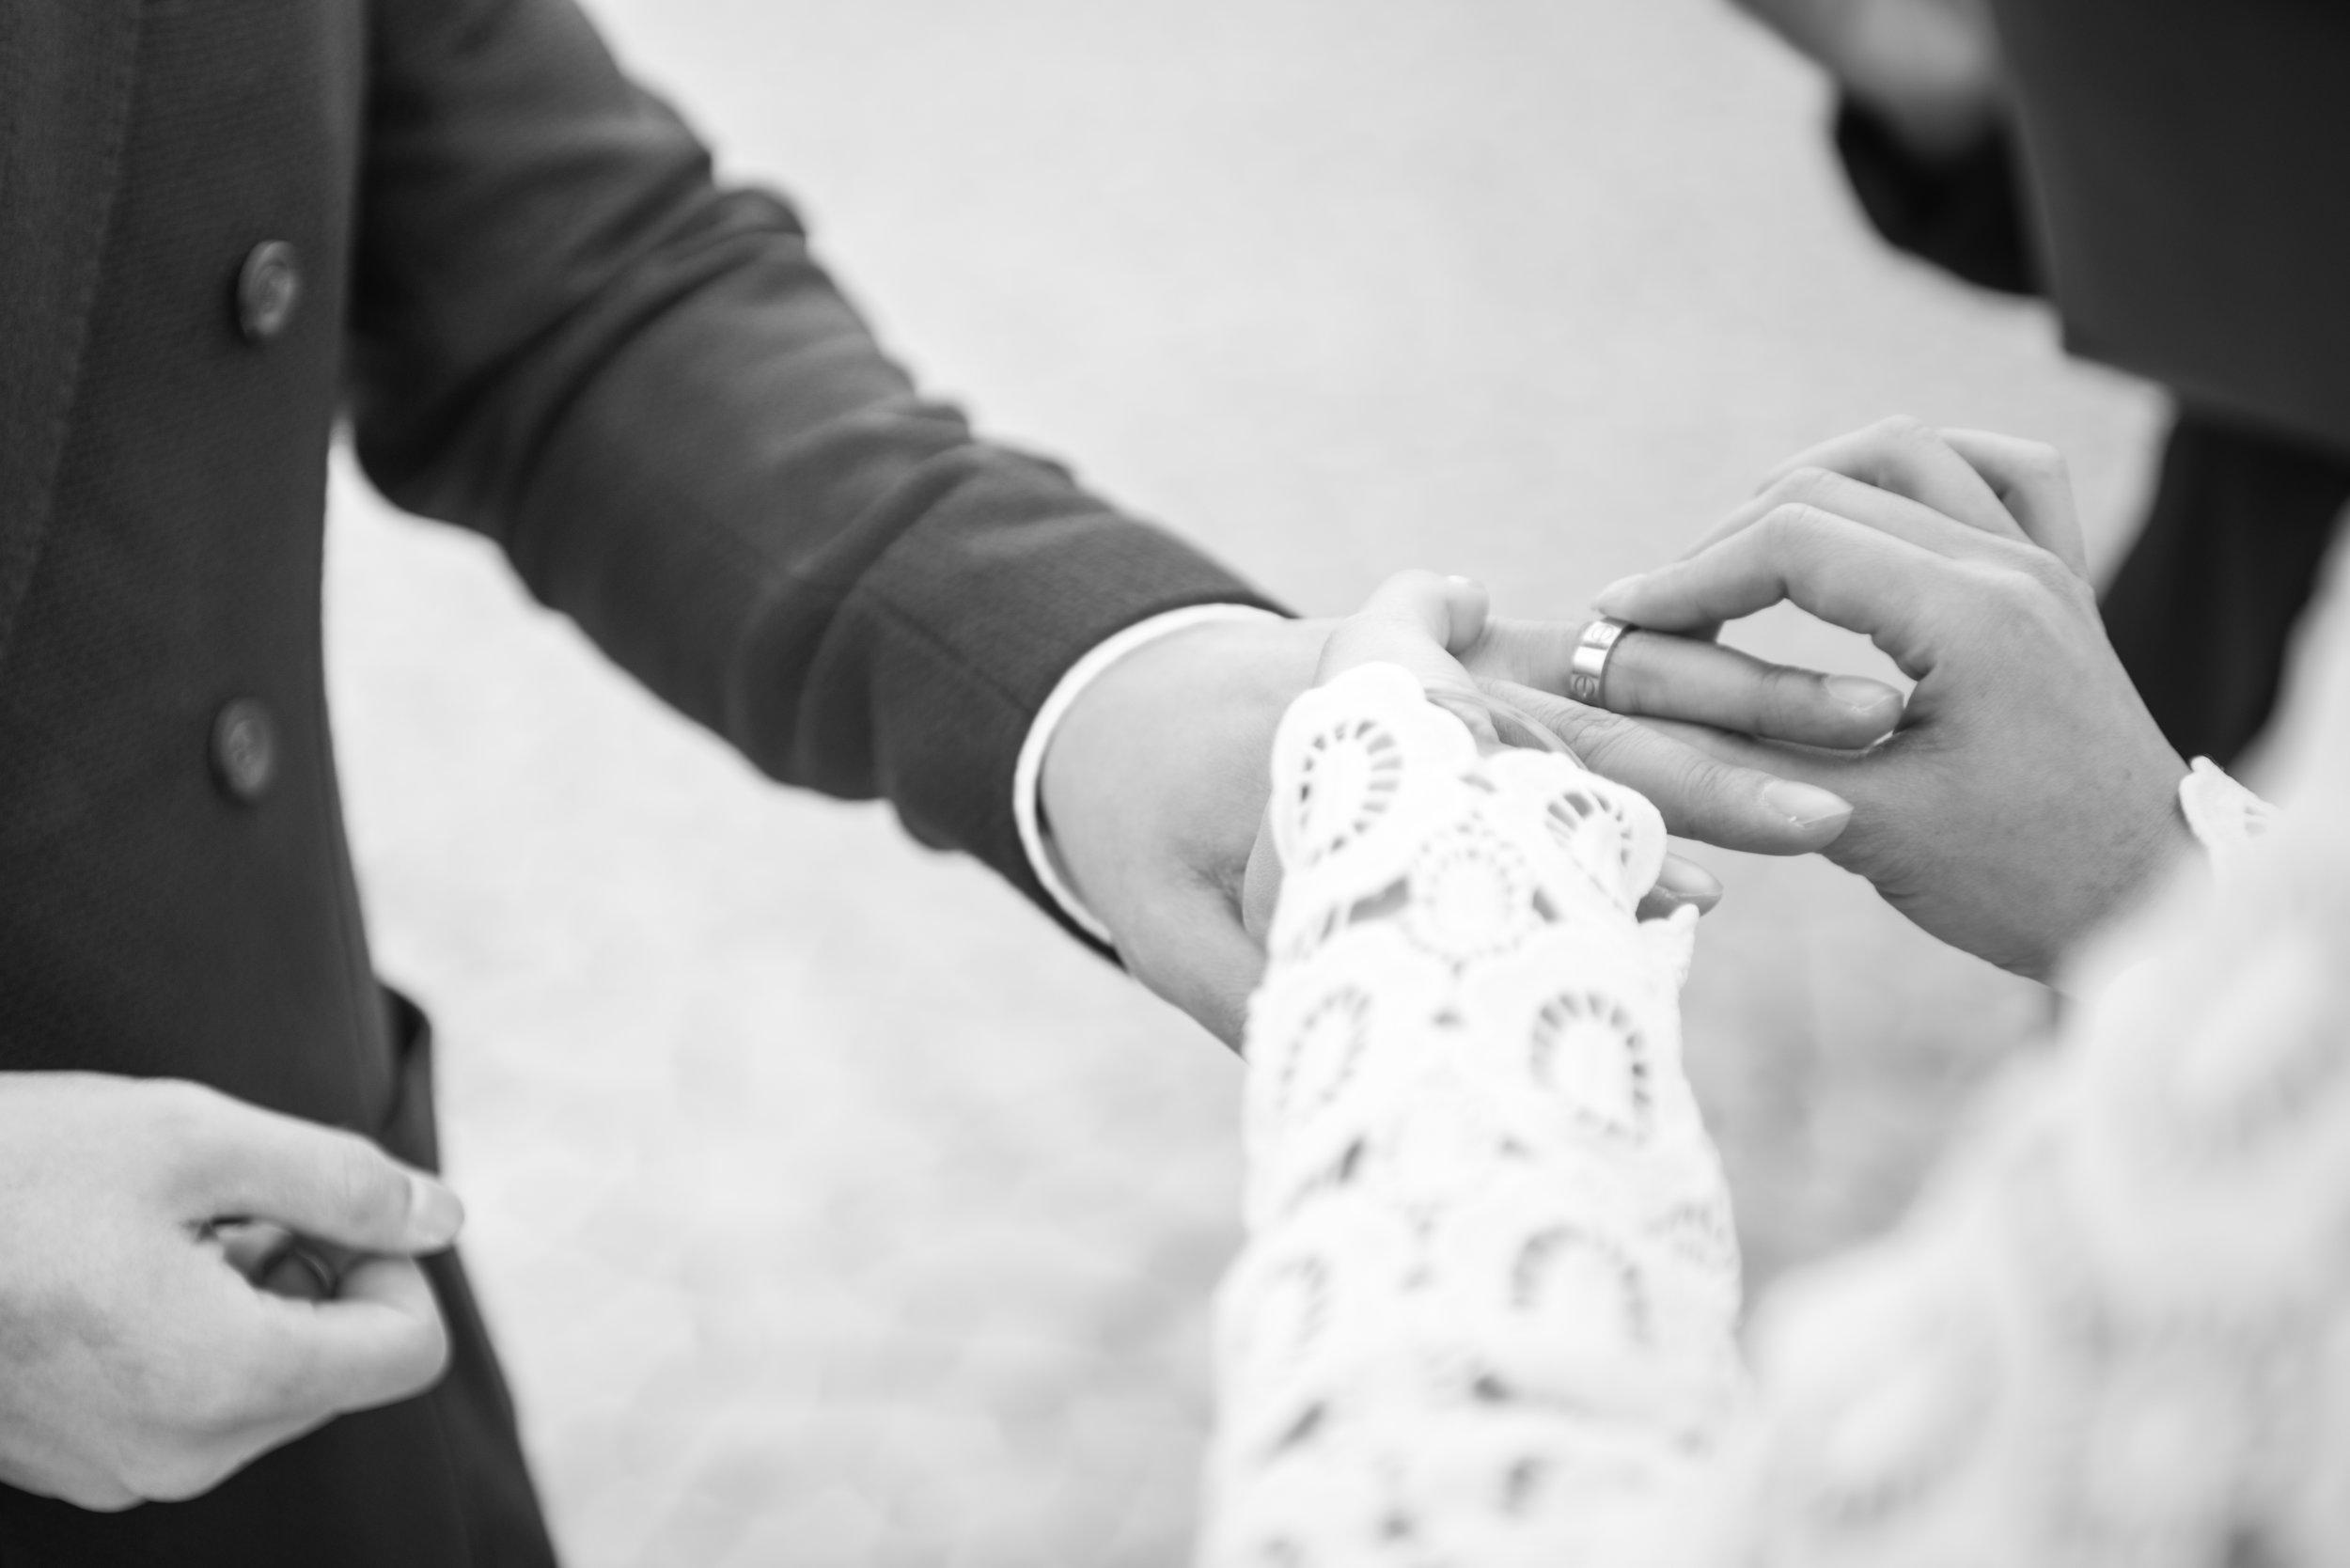 las vegas wedding, peachy keen unions, las vegas elopement, pop up wedding, las vegas, downtown las vegas, dry lake bed, dry lake bed wedding, asian wedding, wedding inspiration, las vegans wedding photographer